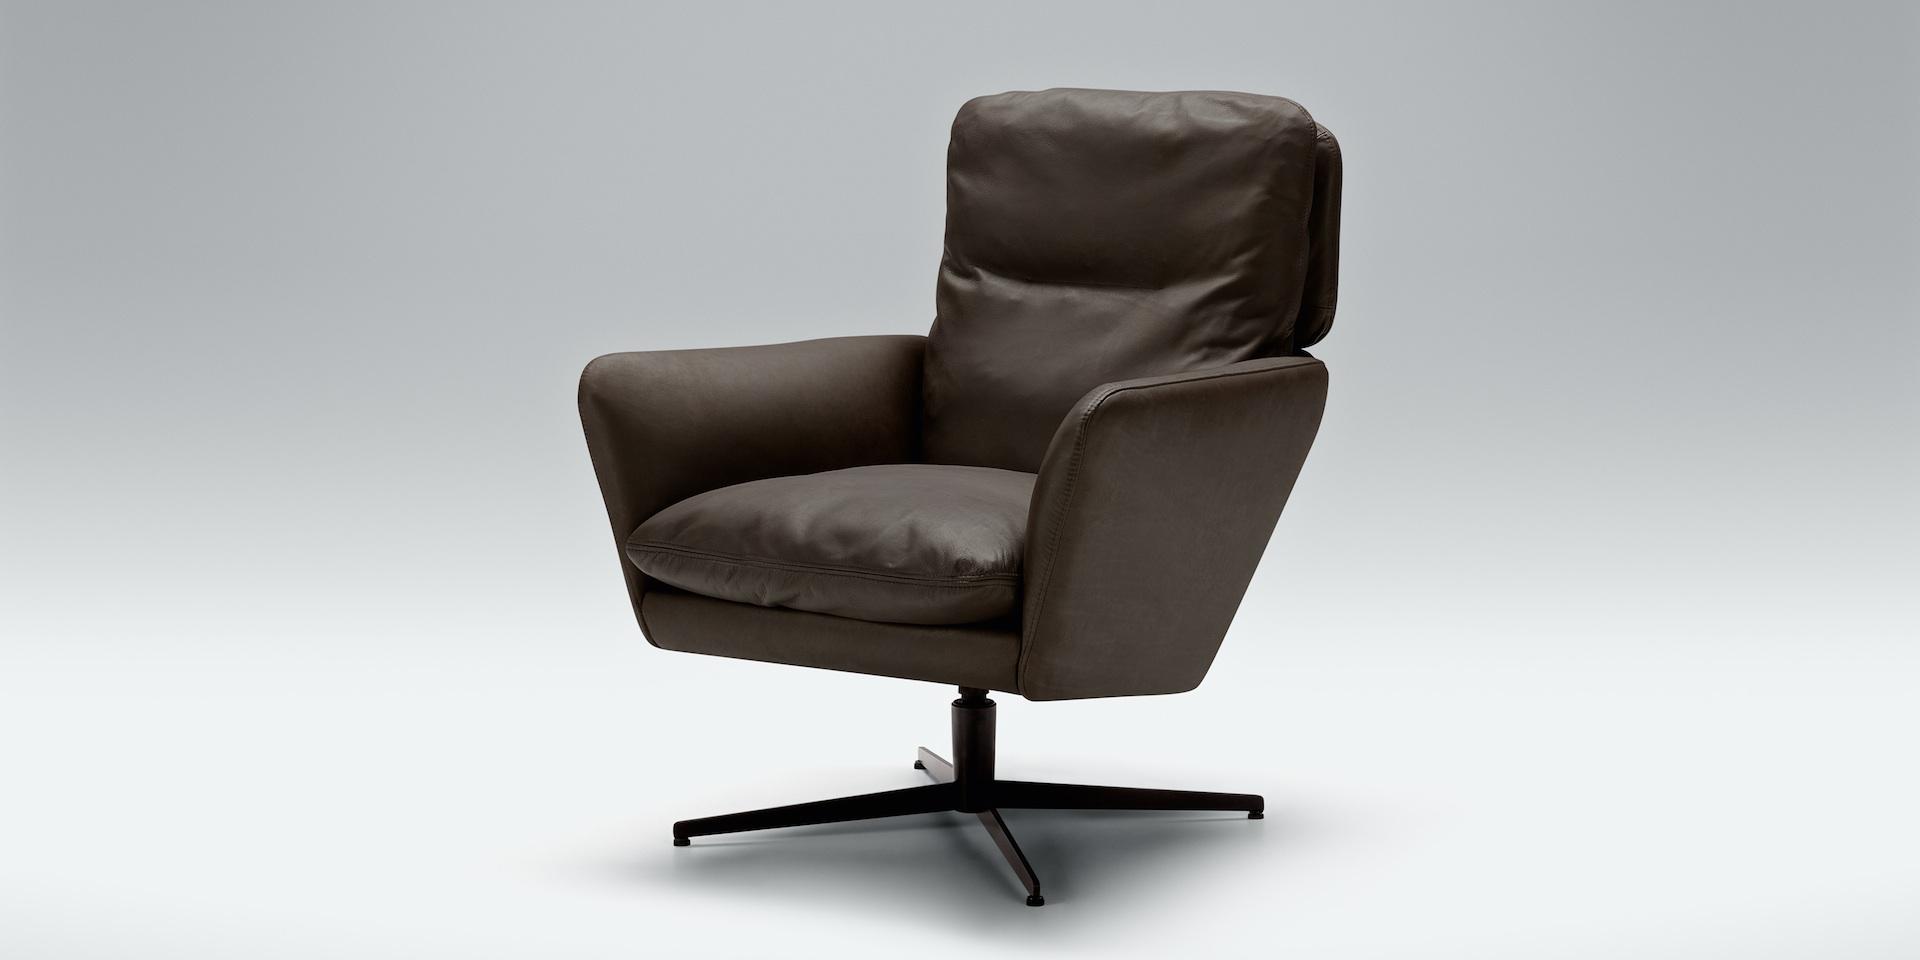 AMY_shadow_armchair_aniline3_dark_brown_2